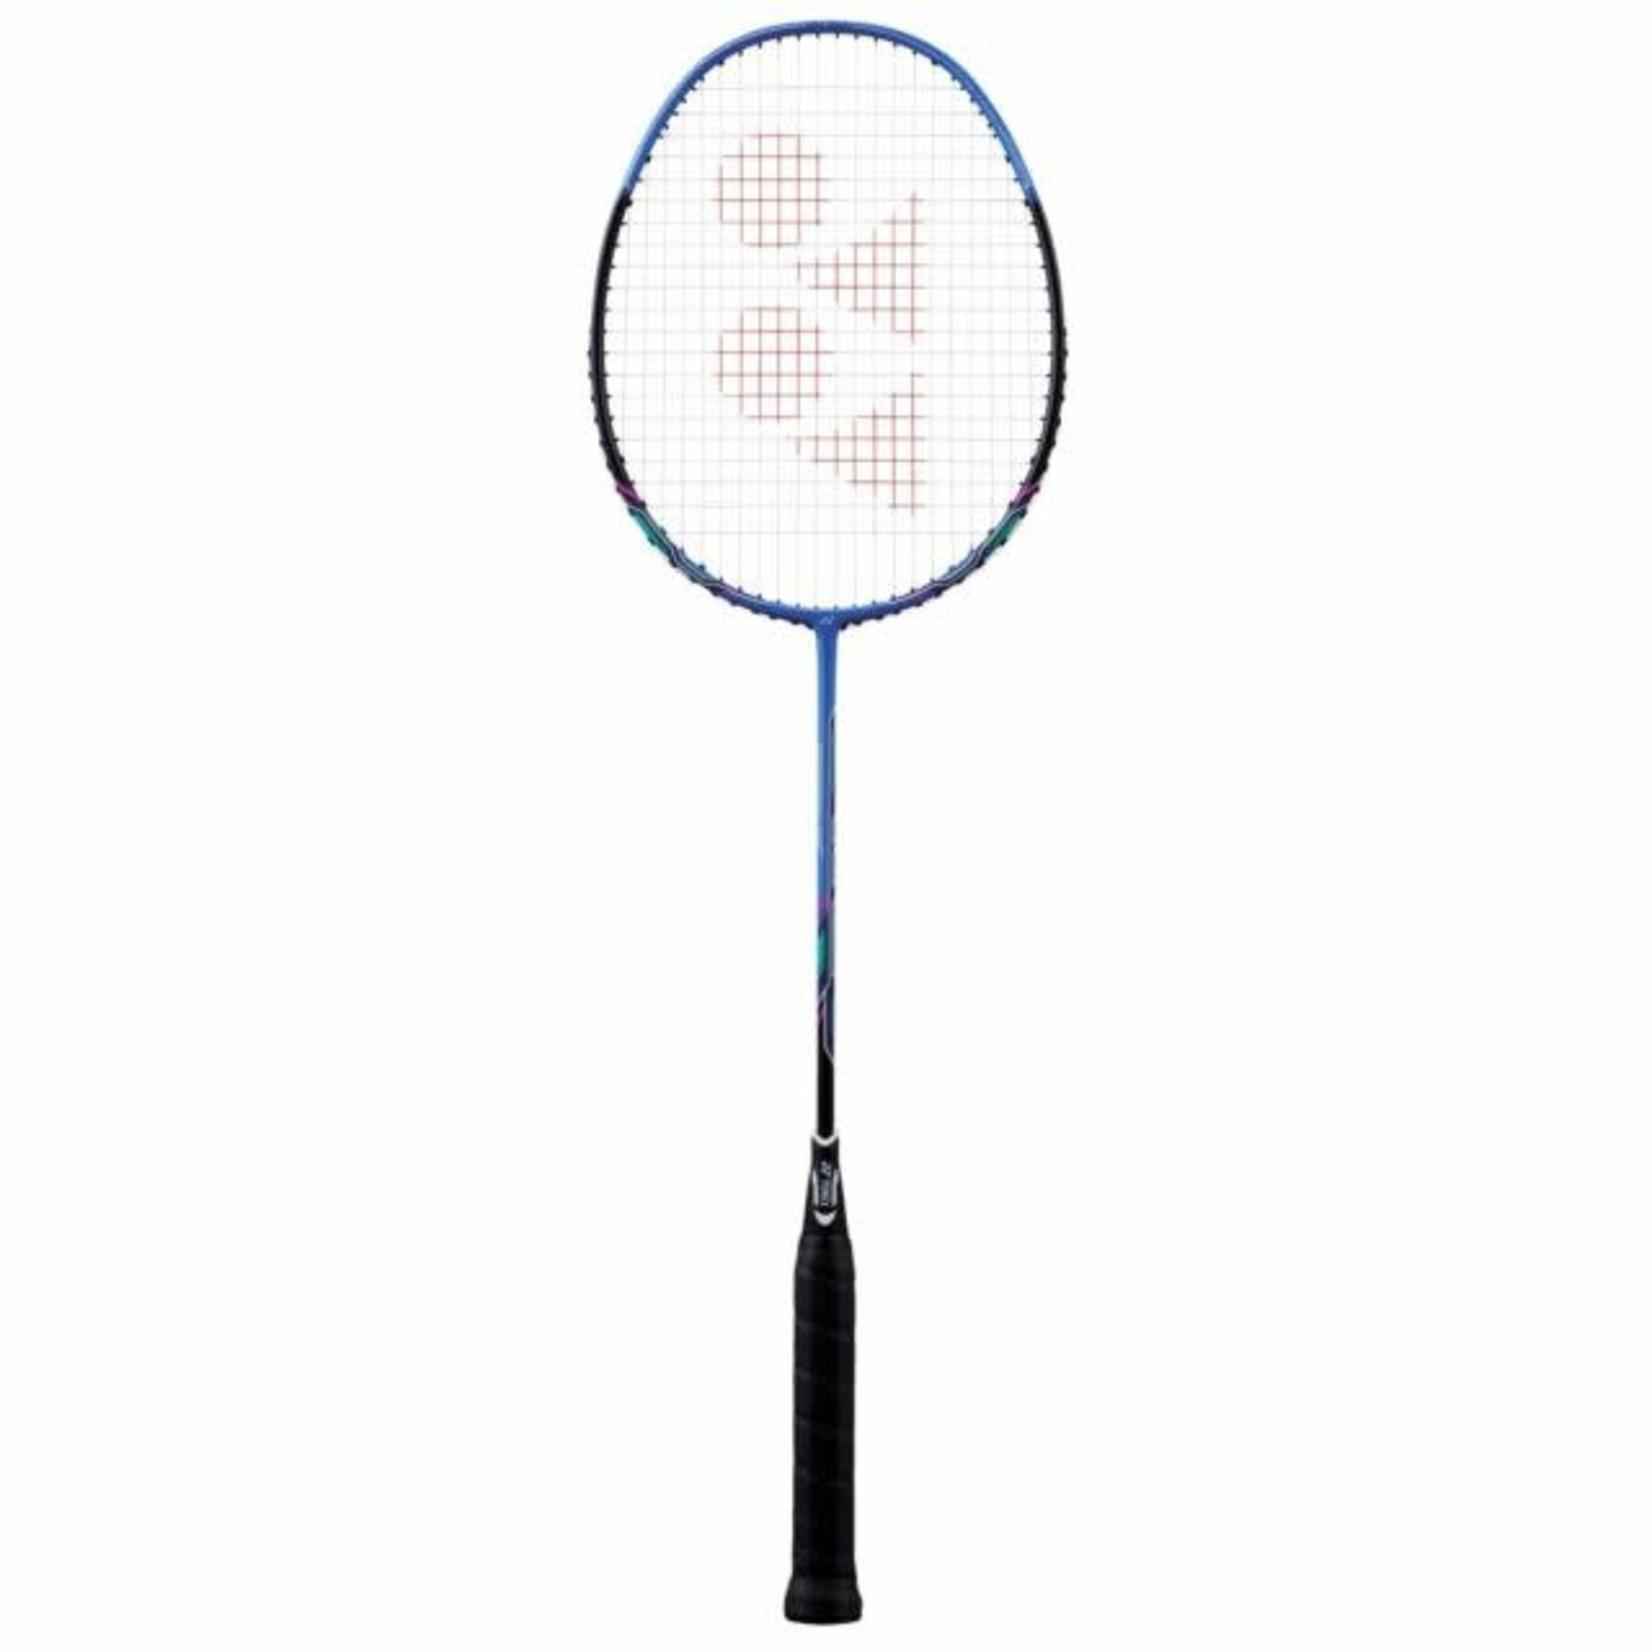 Yonex Yonex Badminton Racquet, Nanoray 10F Strung, 4UG4